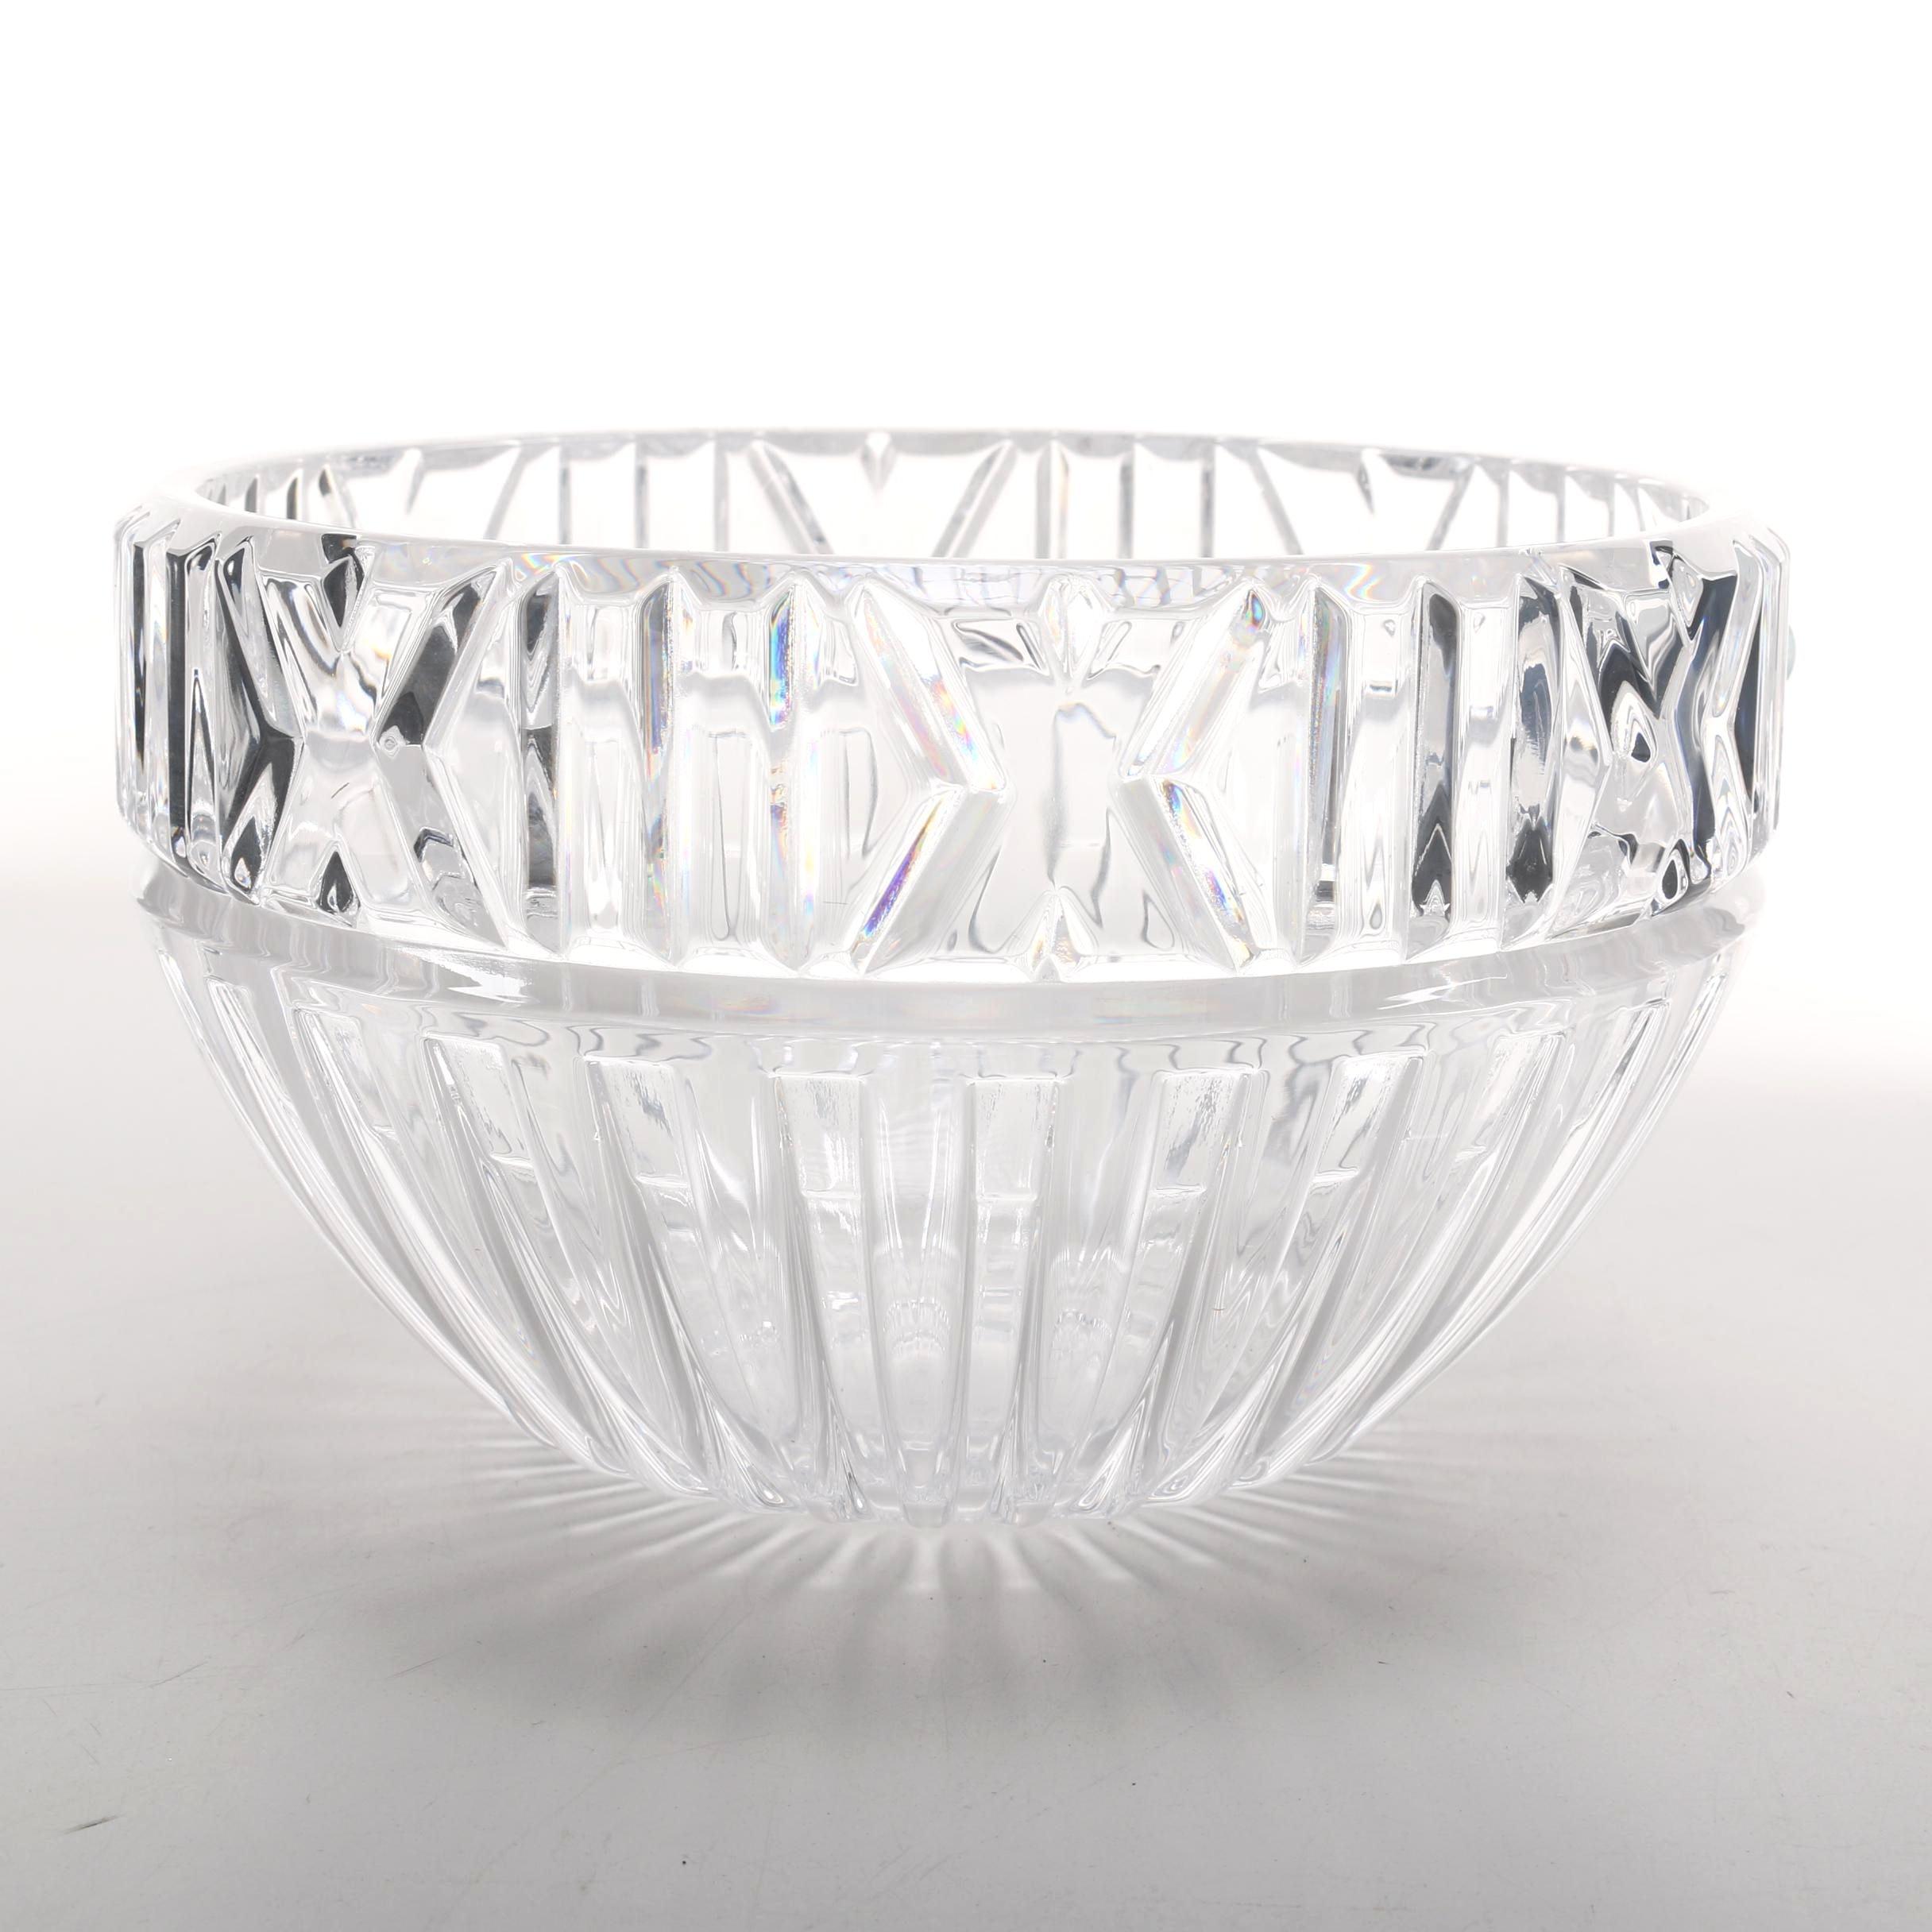 Tiffany & Co. Crystal Bowl